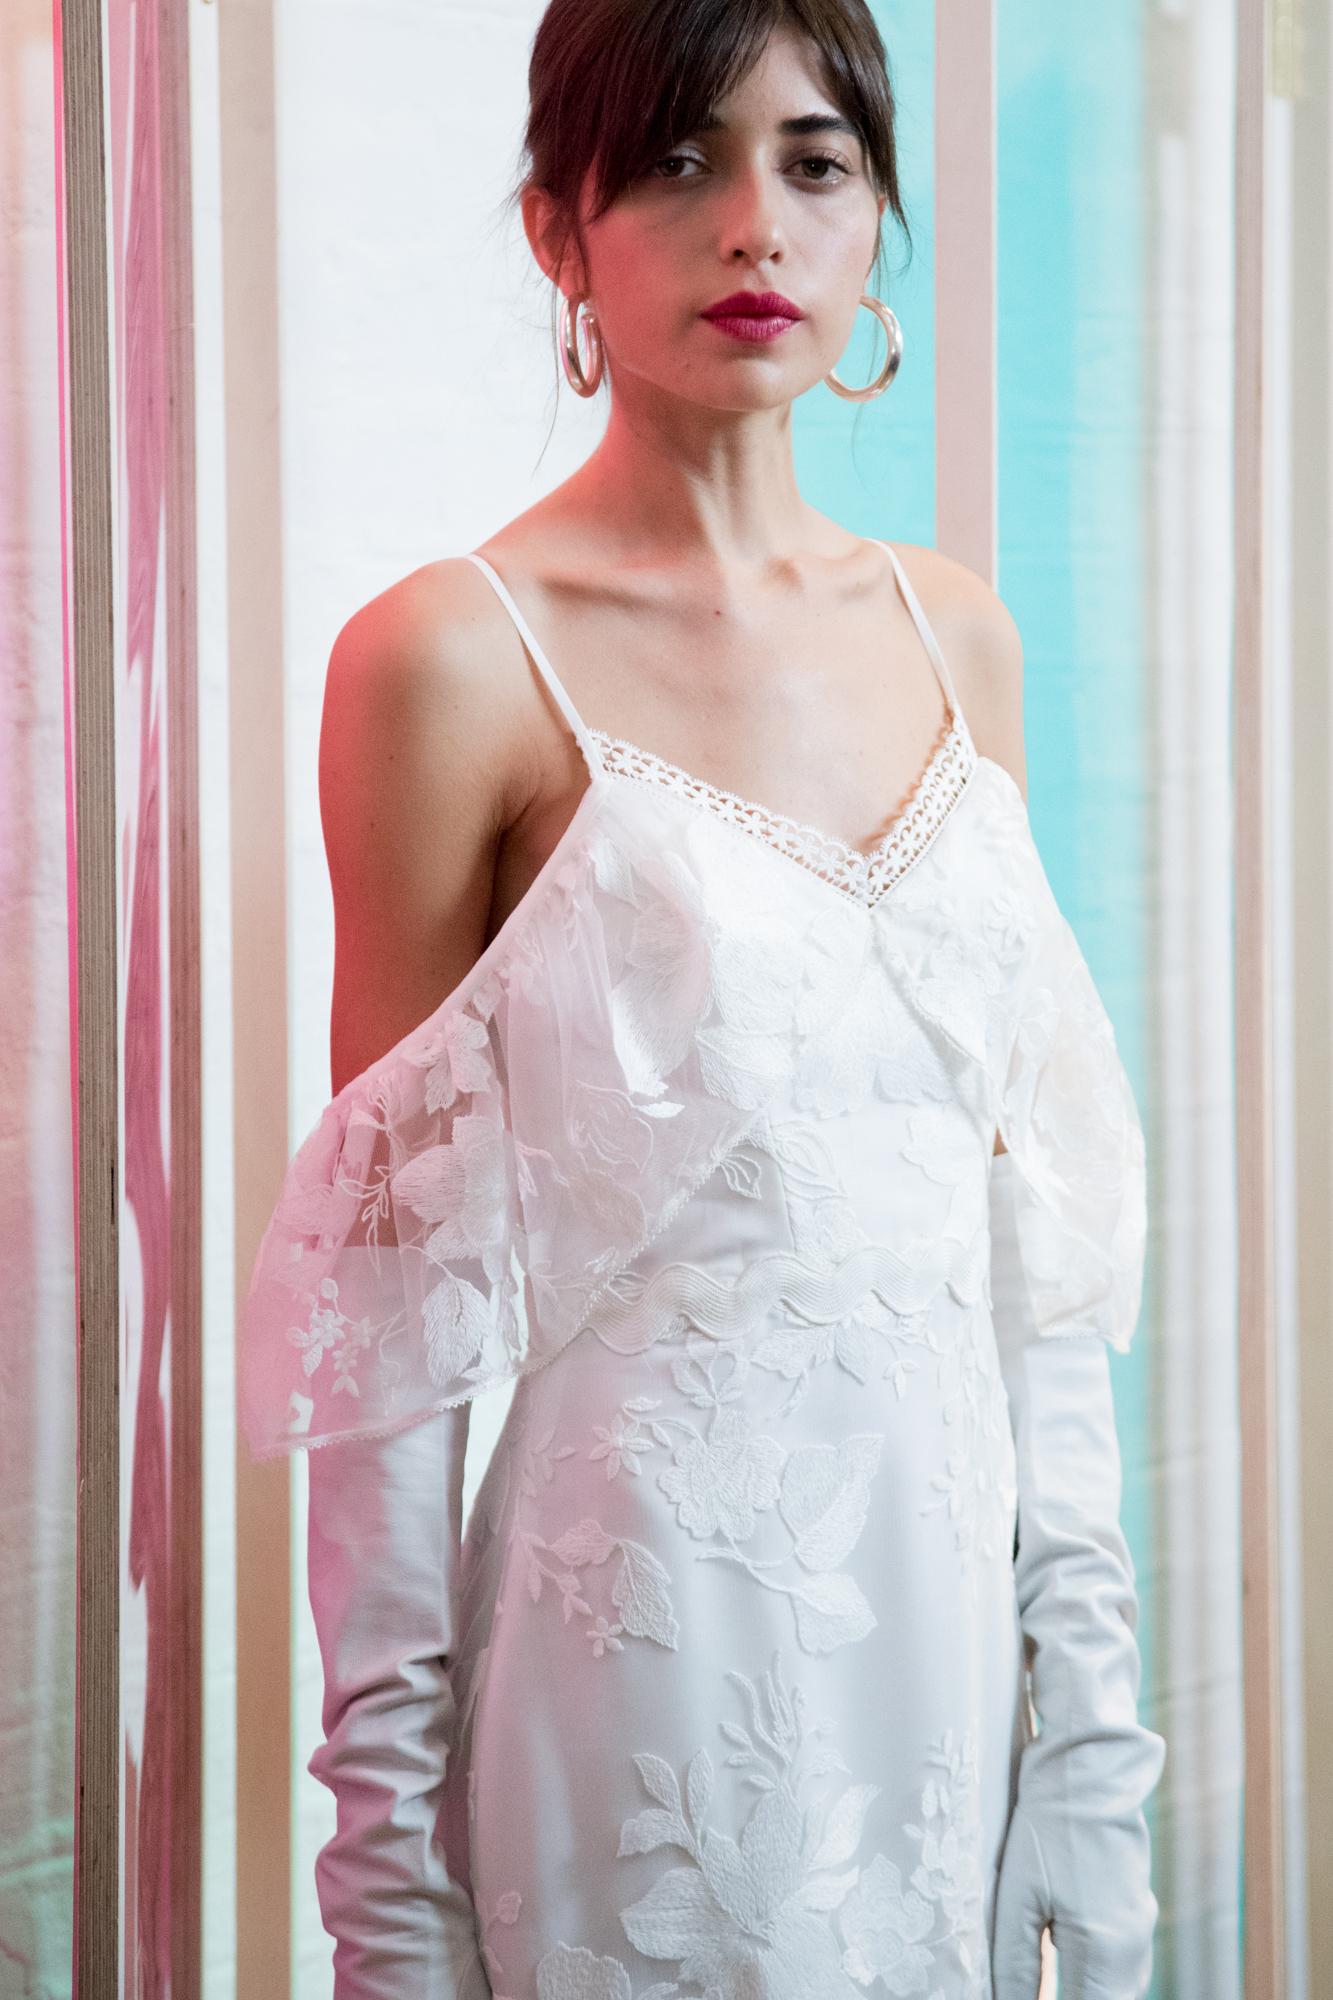 Pure white with ruffles and texture - photo Carro Studio